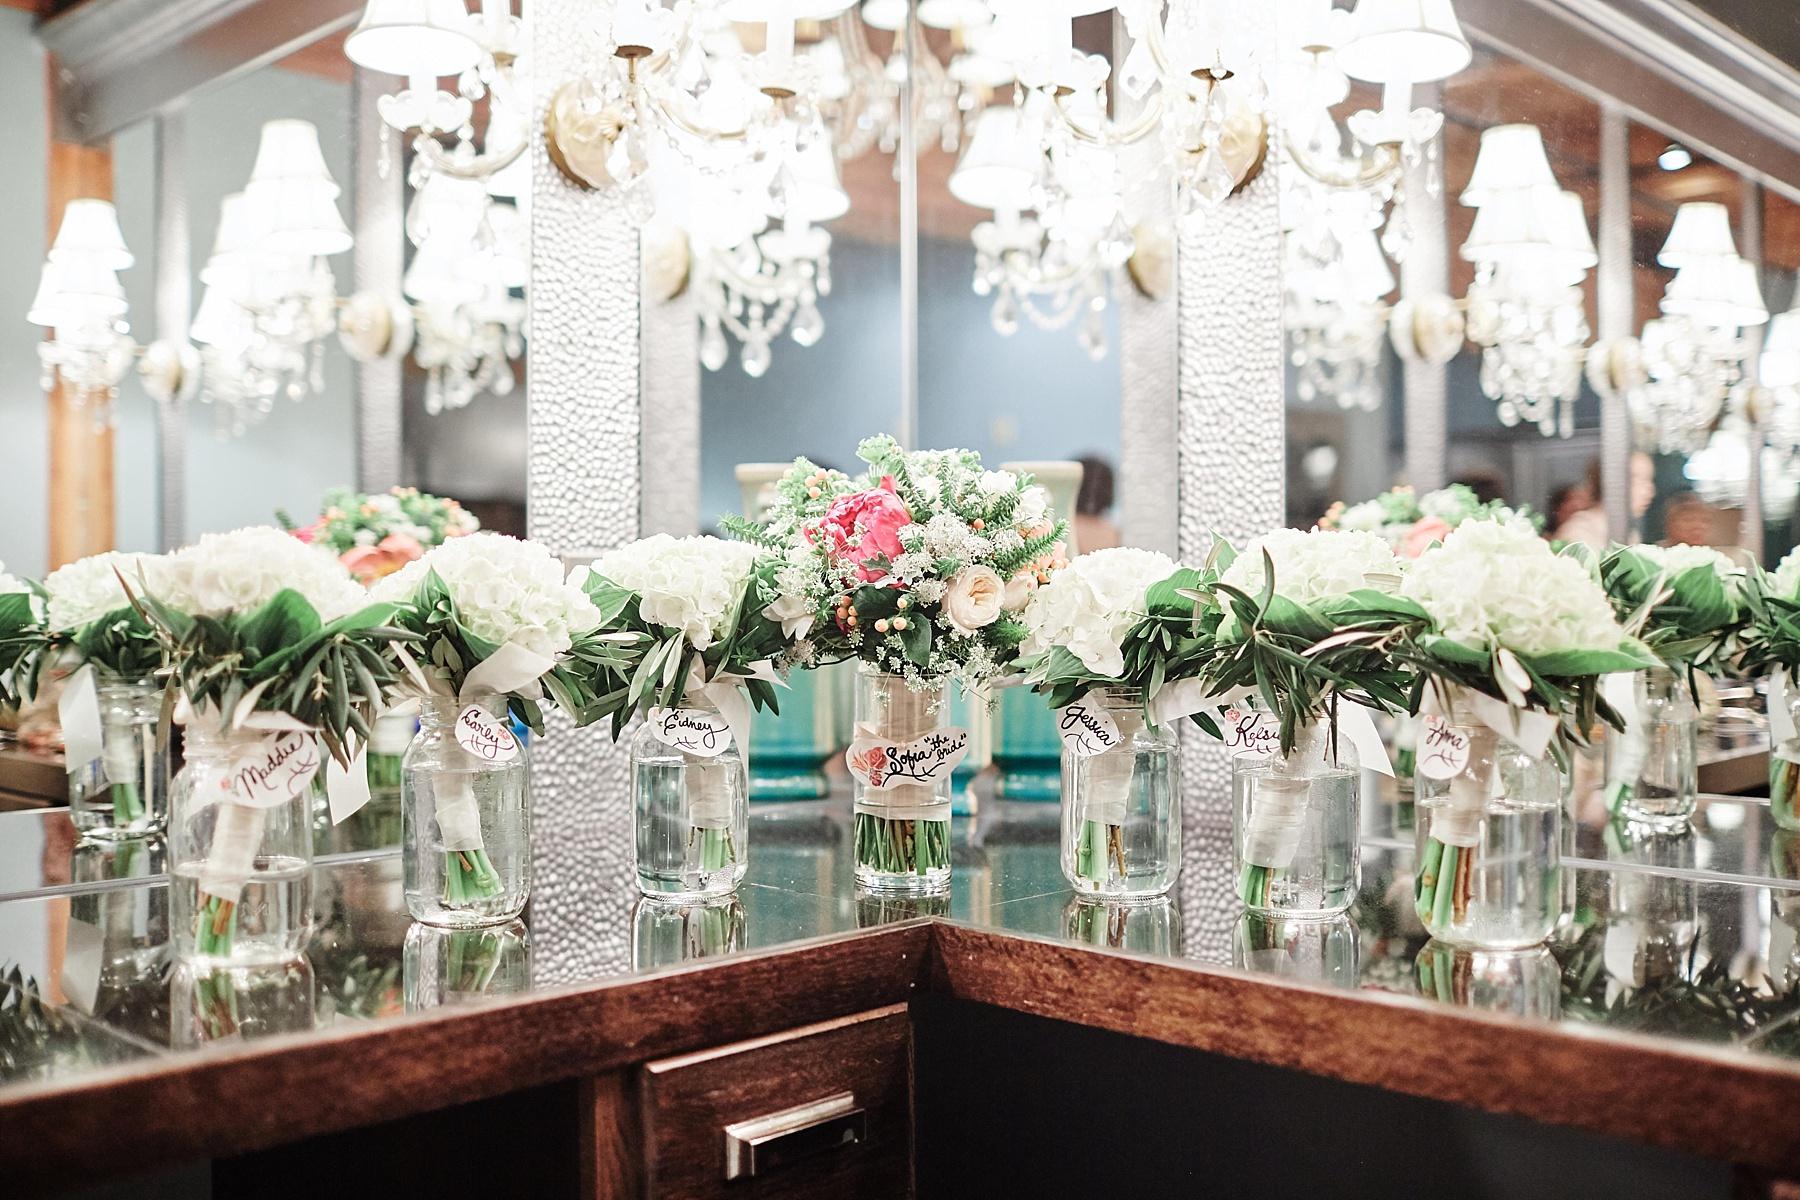 ABULAE-Wedding-Saint-paul-MN-Josh-Sofia-Wedding-Mears-Park_0727.jpg